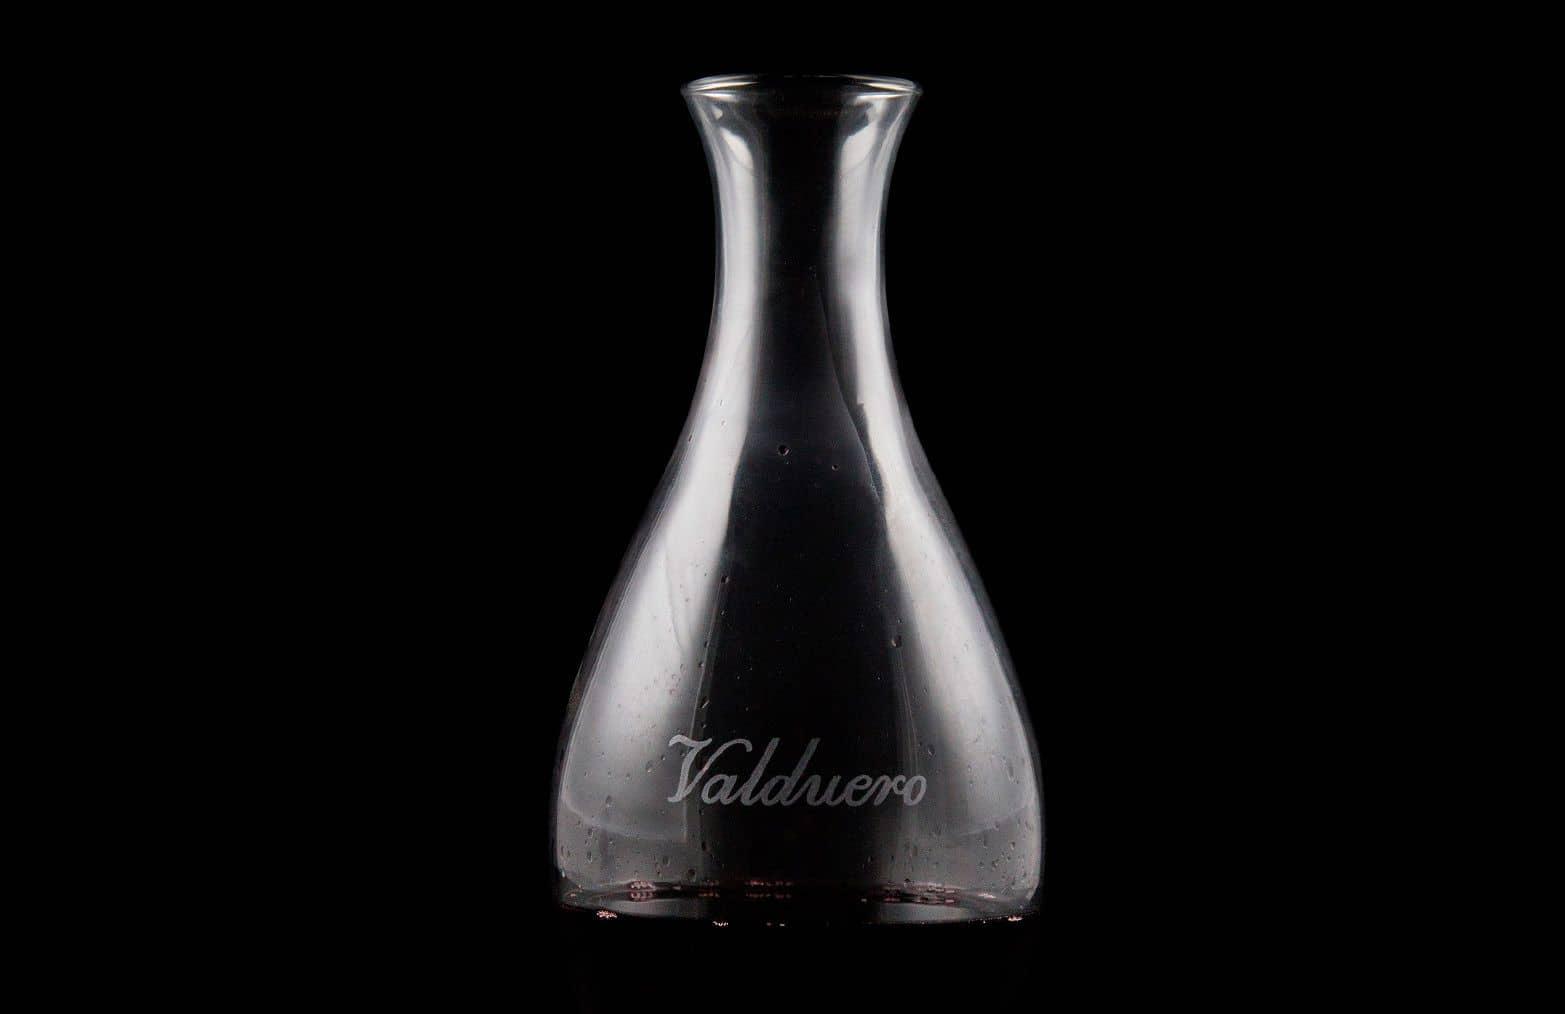 Decantador de Bodegas Valduero, accesorios de vino, Ribera del Duero